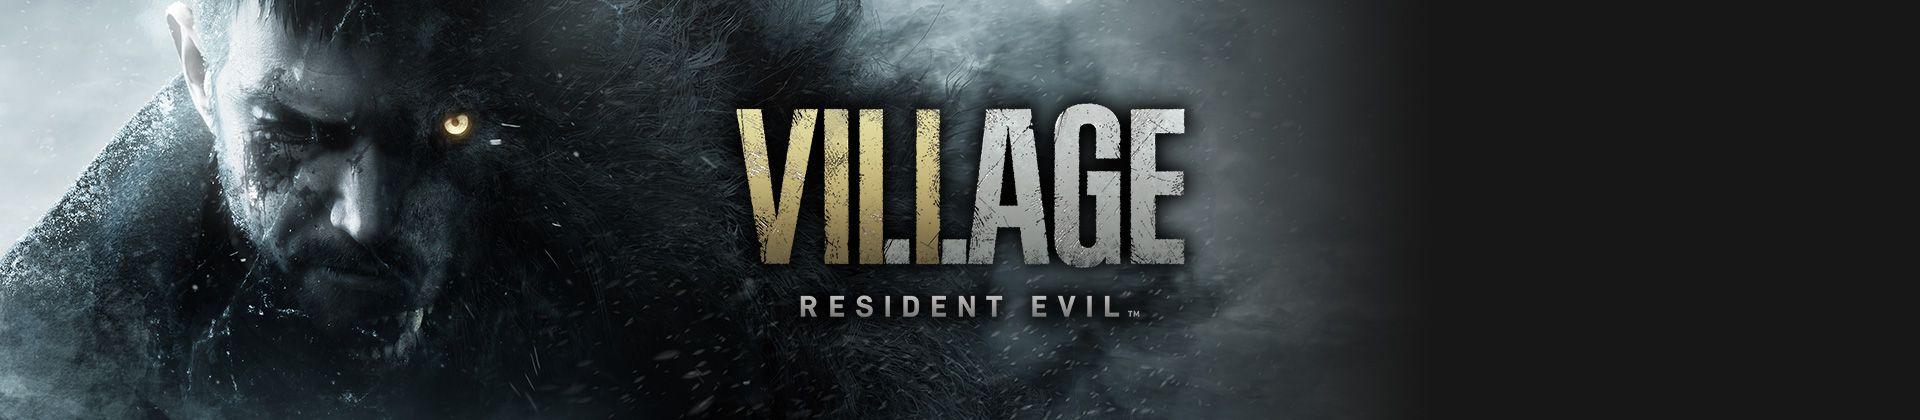 village resident